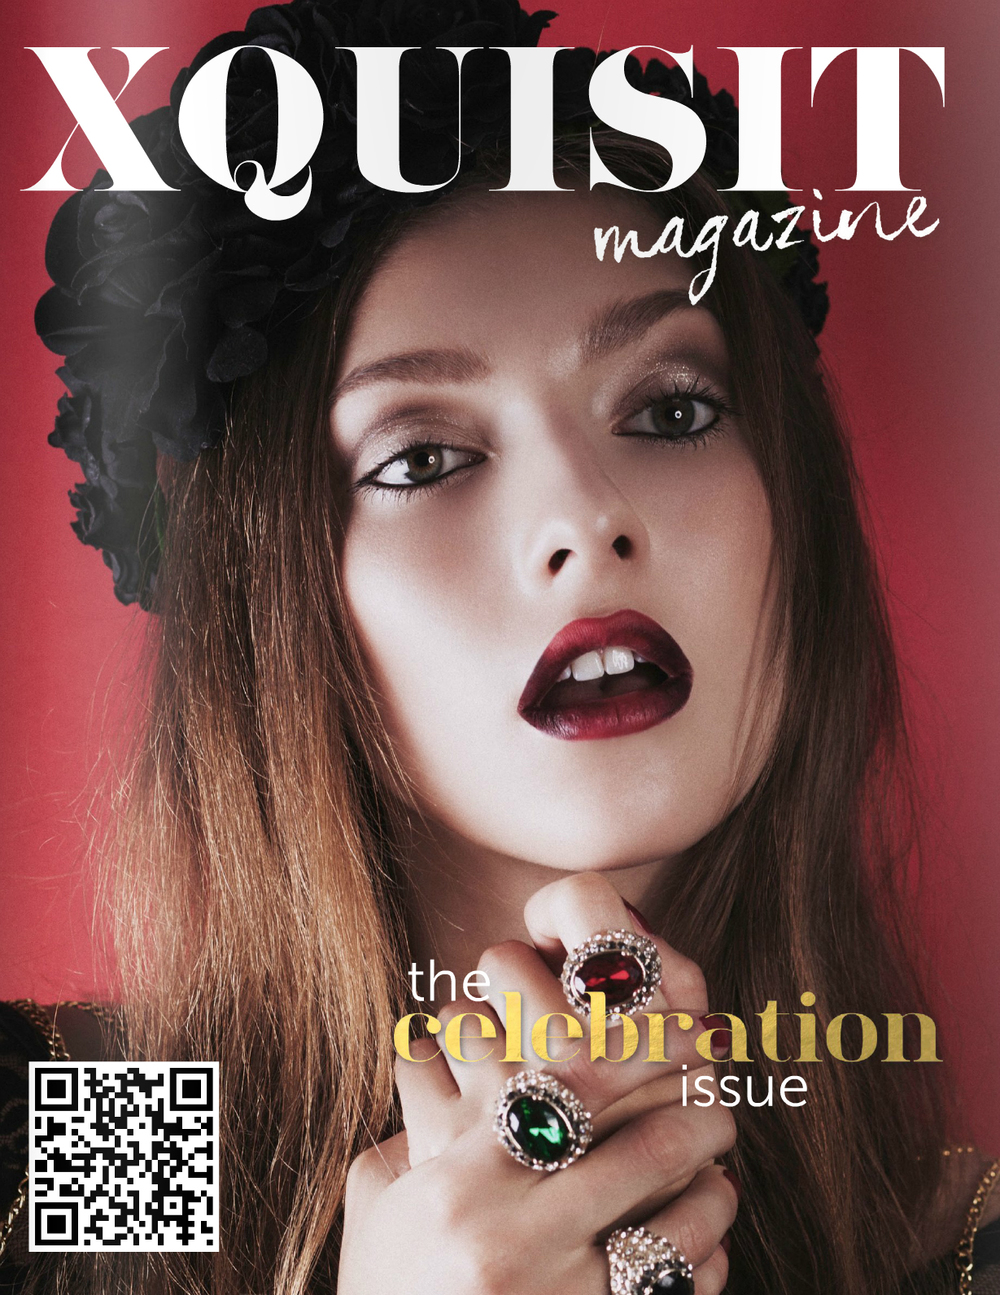 Xquisit Magazine